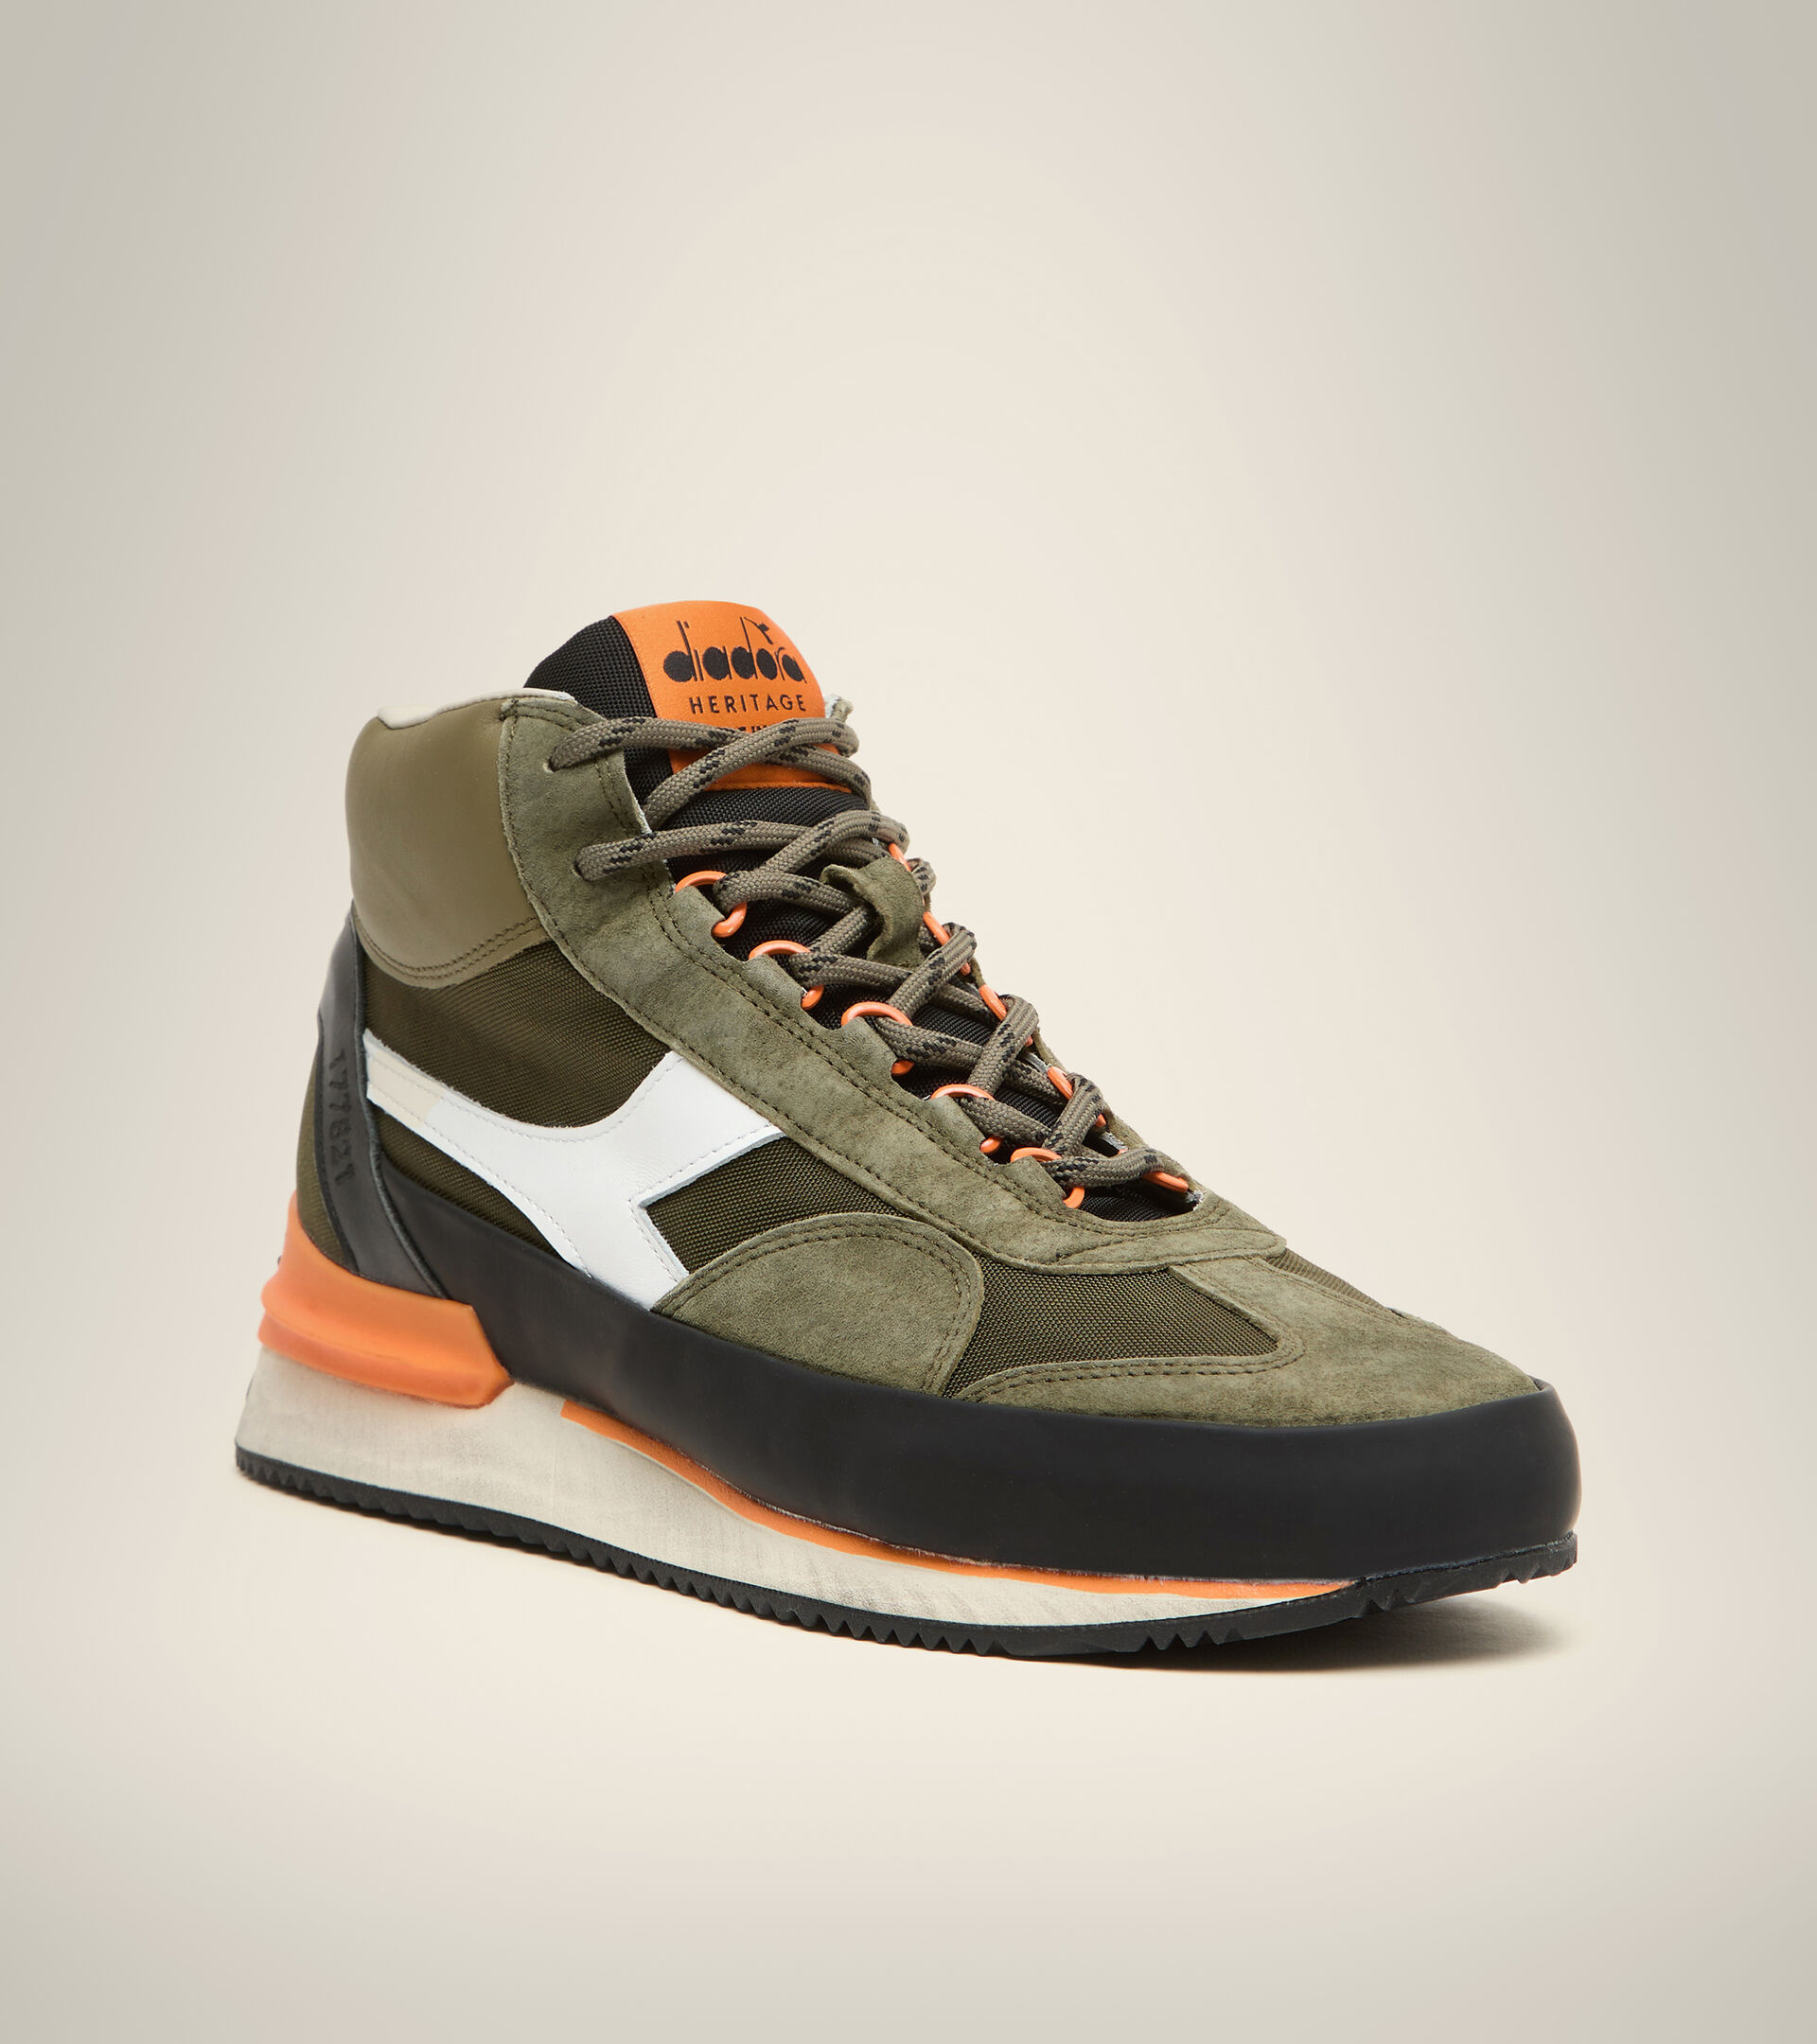 Heritage-Schuh Made in Italy - Herren EQUIPE MID MAD ITALIA NUBUCK SW OLIVIN - Diadora